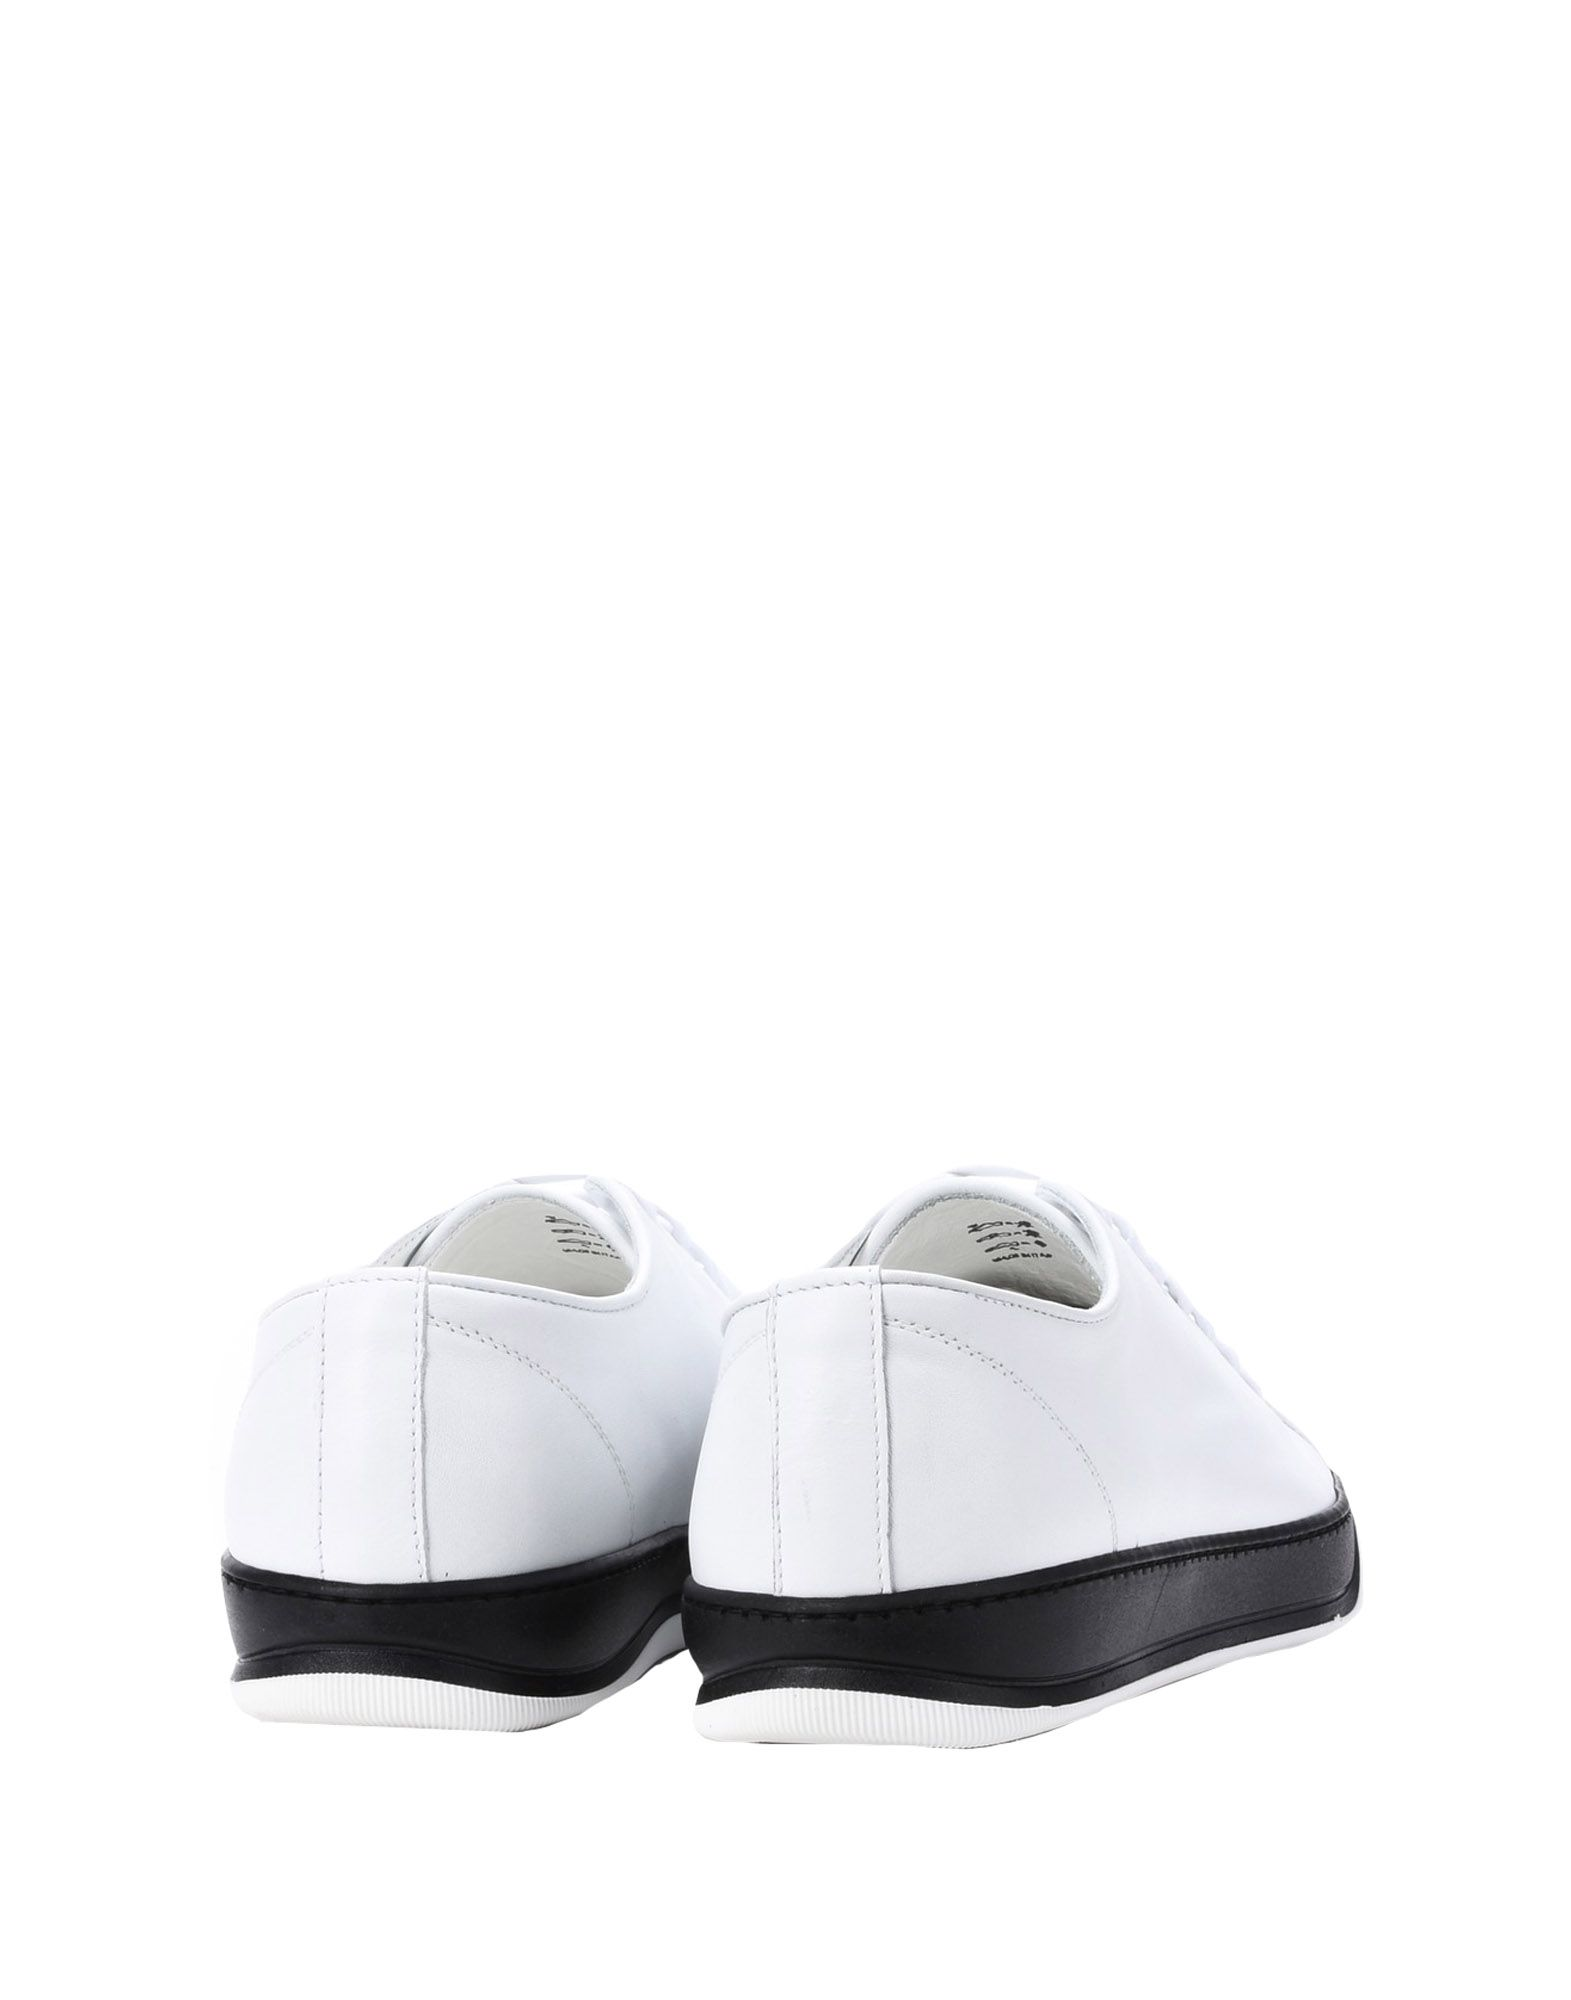 8 Sneakers Herren  11406937QQ Schuhe Heiße Schuhe 11406937QQ f1f22c